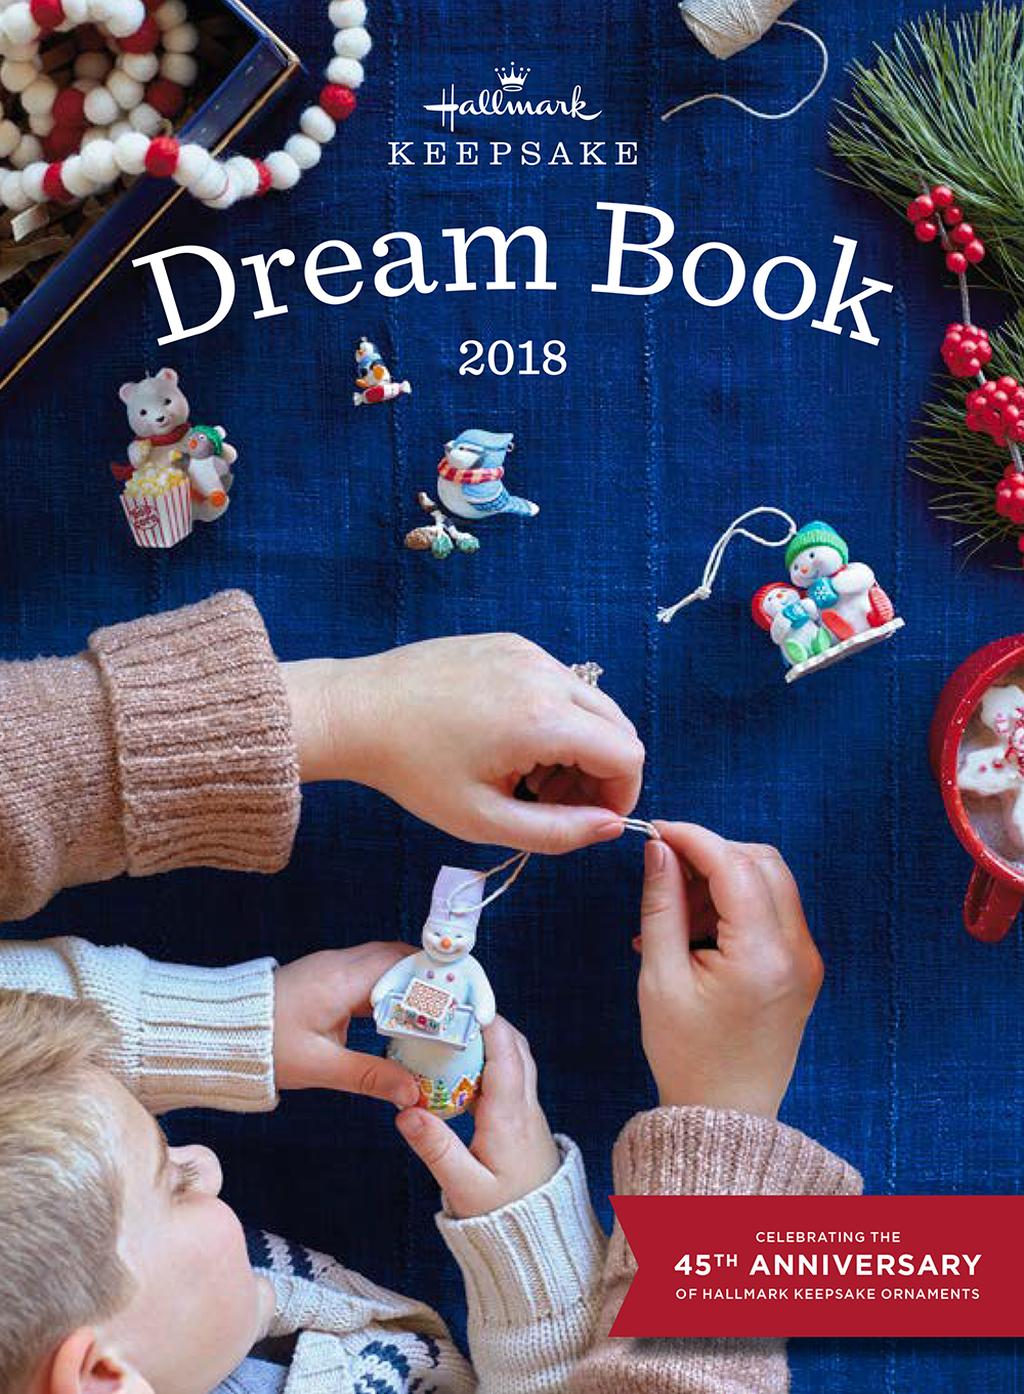 Hallmark 2019 Christmas Ornaments Hallmark Dream Book 2019 | Browse Keepsake Ornaments Online | Hallmark